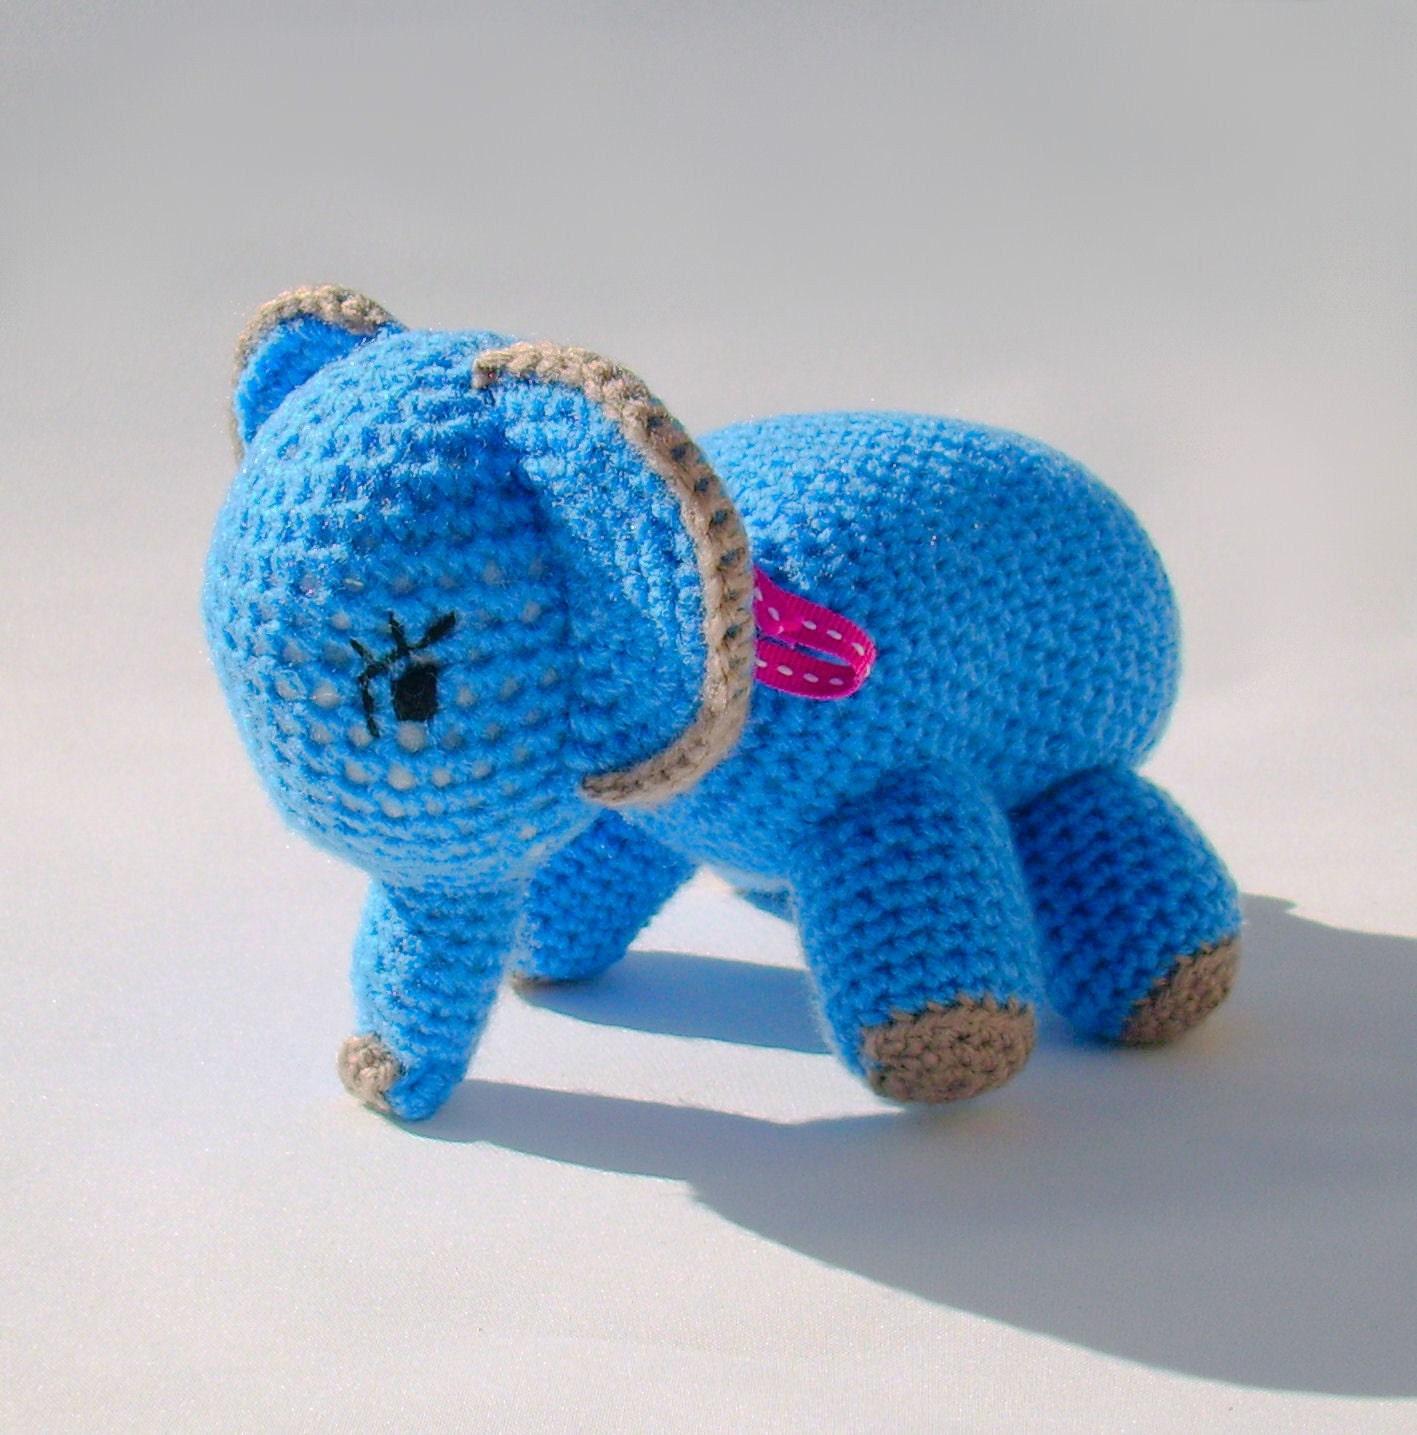 Crochet elephant handmade toy amigurumi traditional by jarg0n